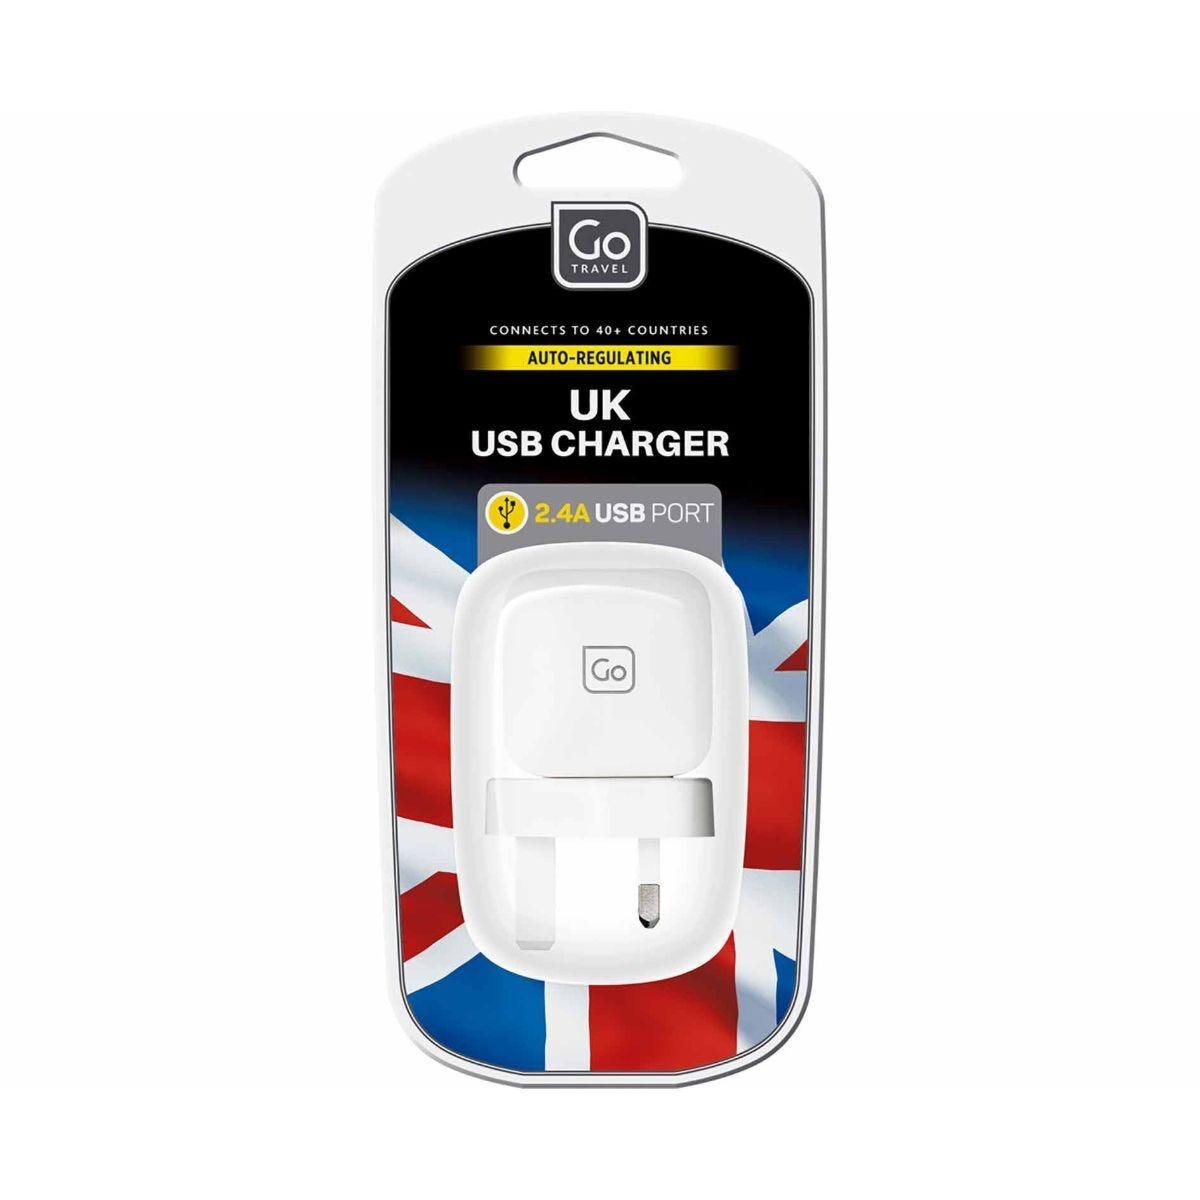 Go Travel 2.4A USB Charger Plug UK